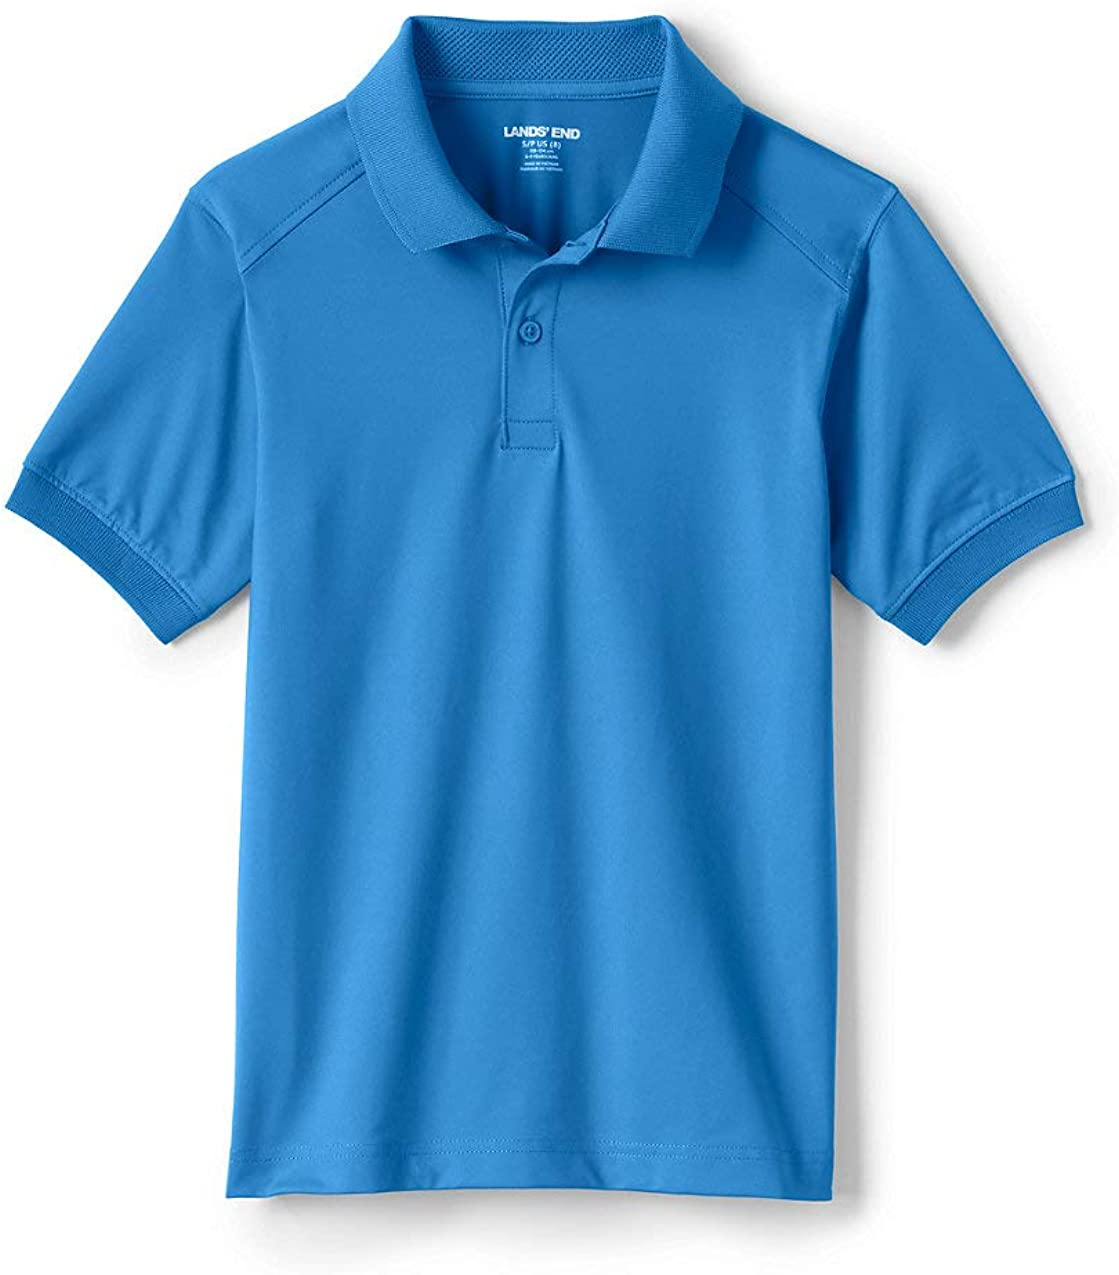 Lands' End School Uniform Kids Short Sleeve Rapid Dry Polo Shirt